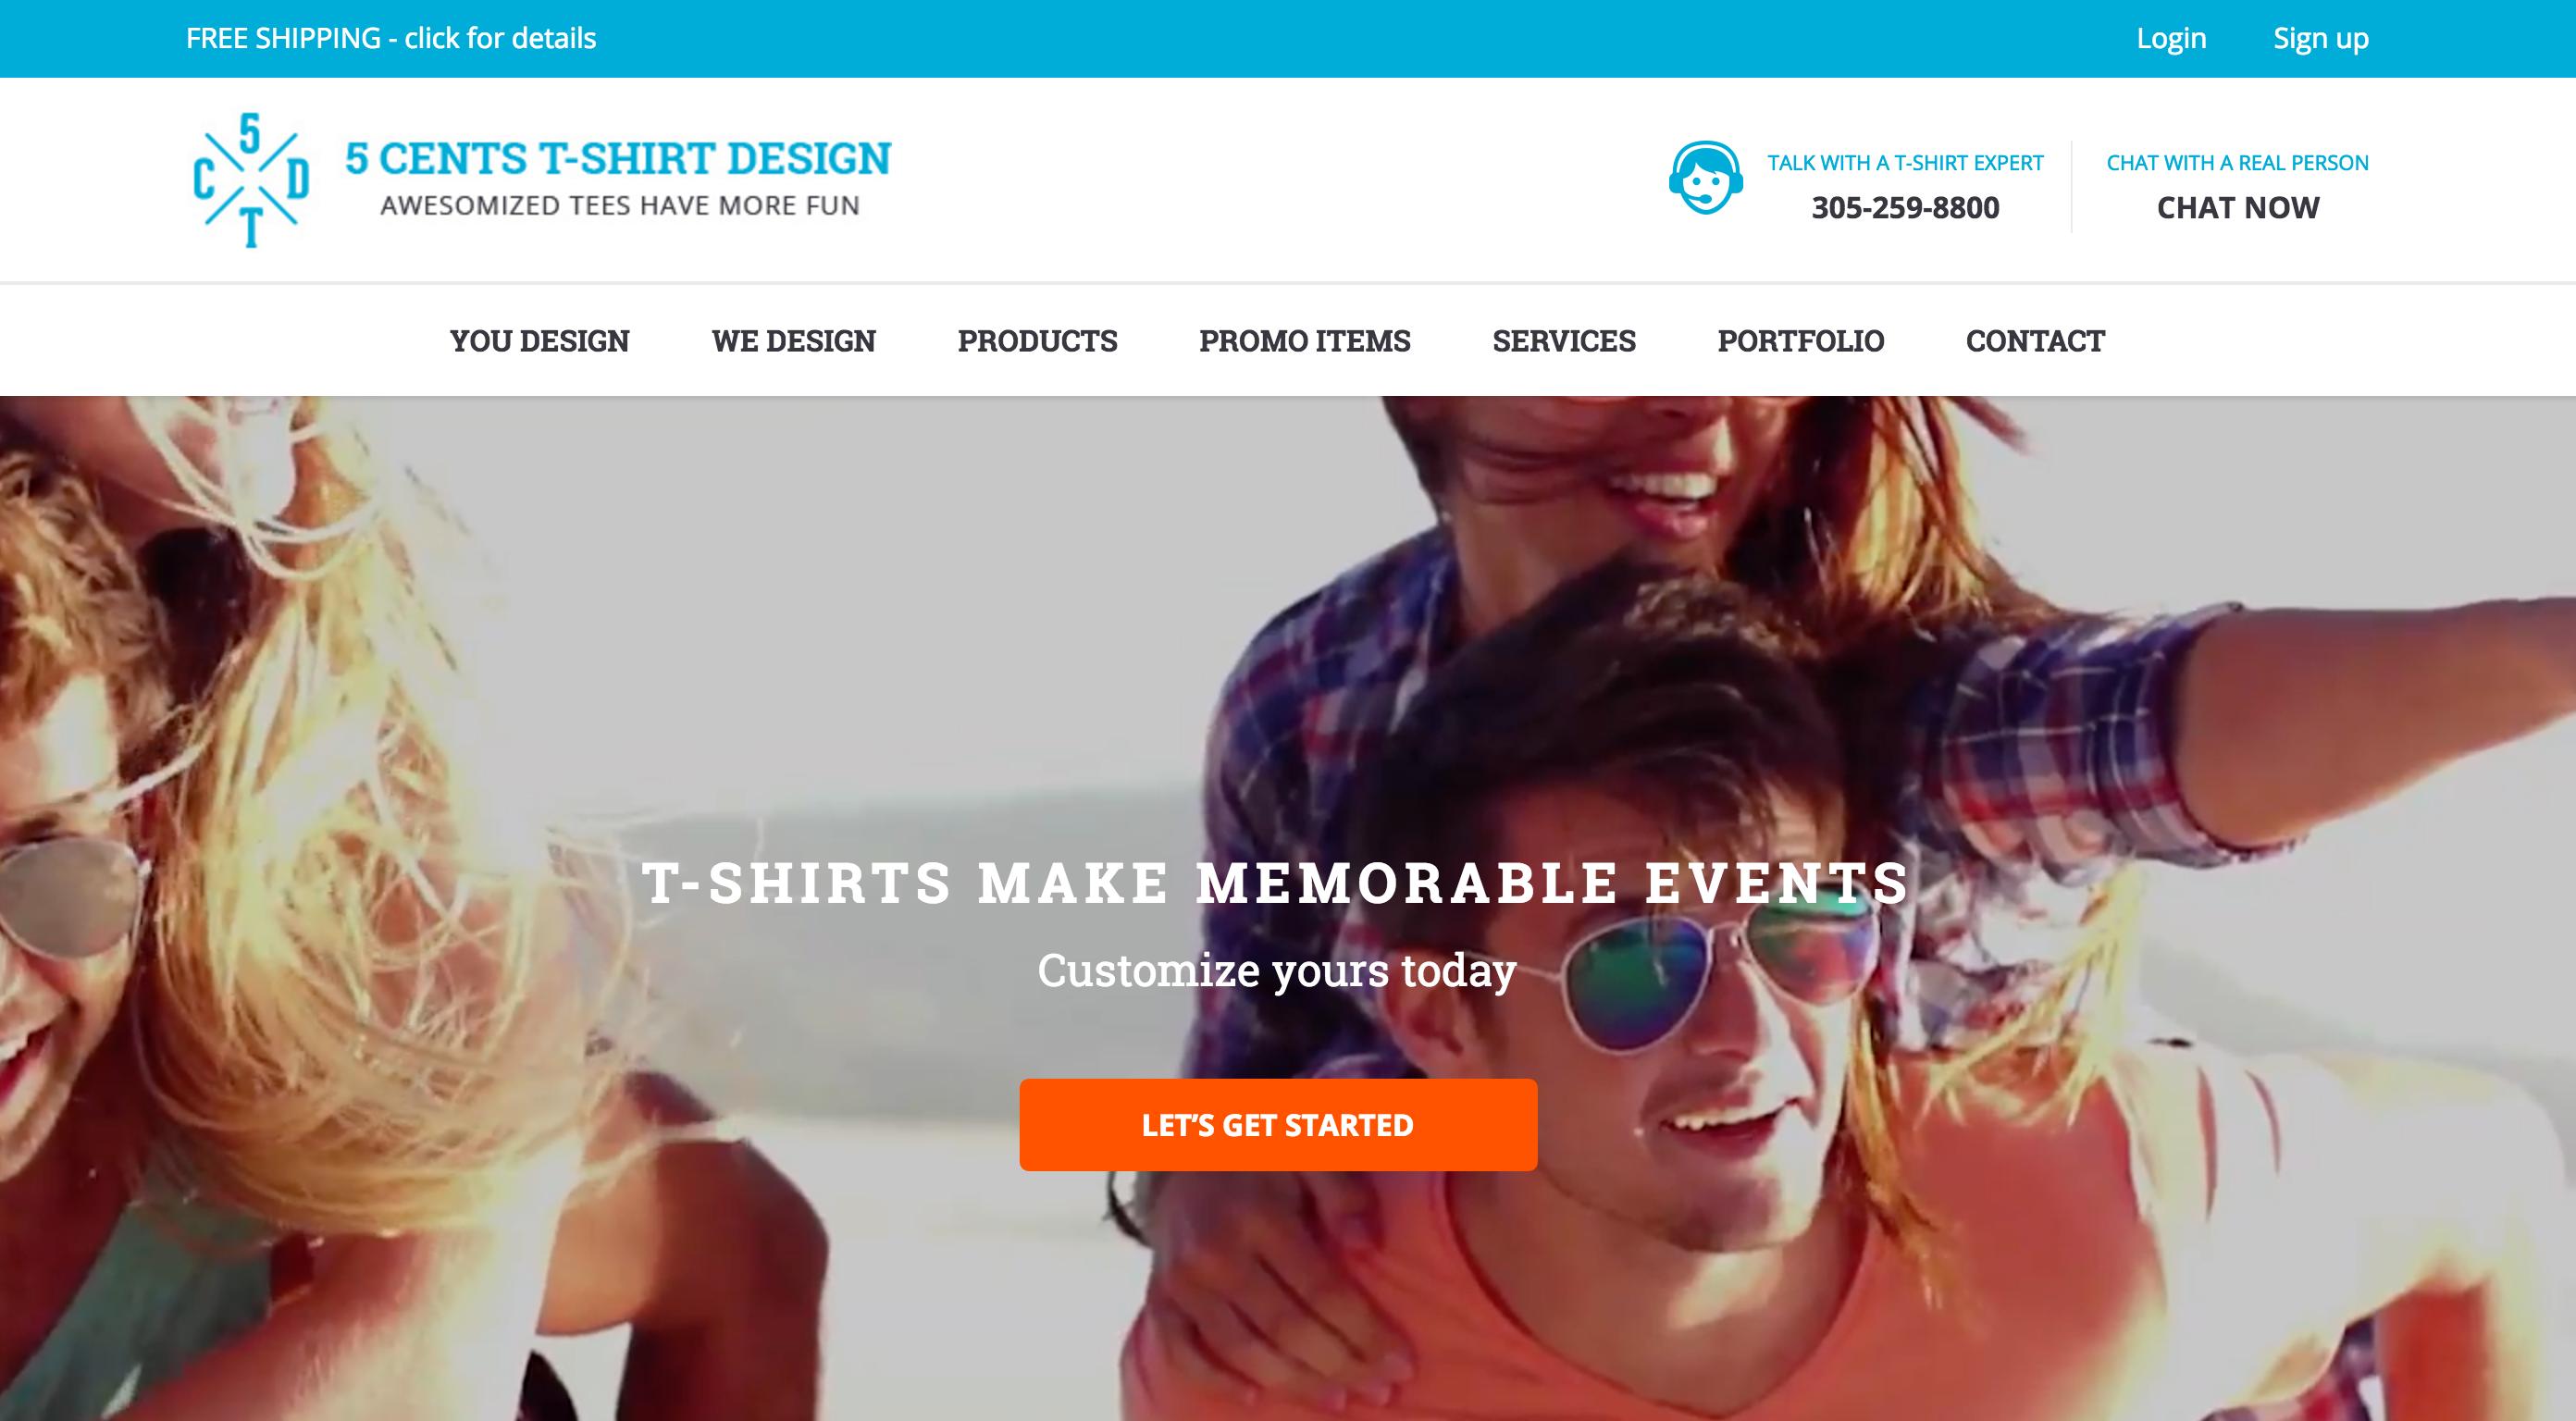 5 Cents T Shirt Design Woocommerce